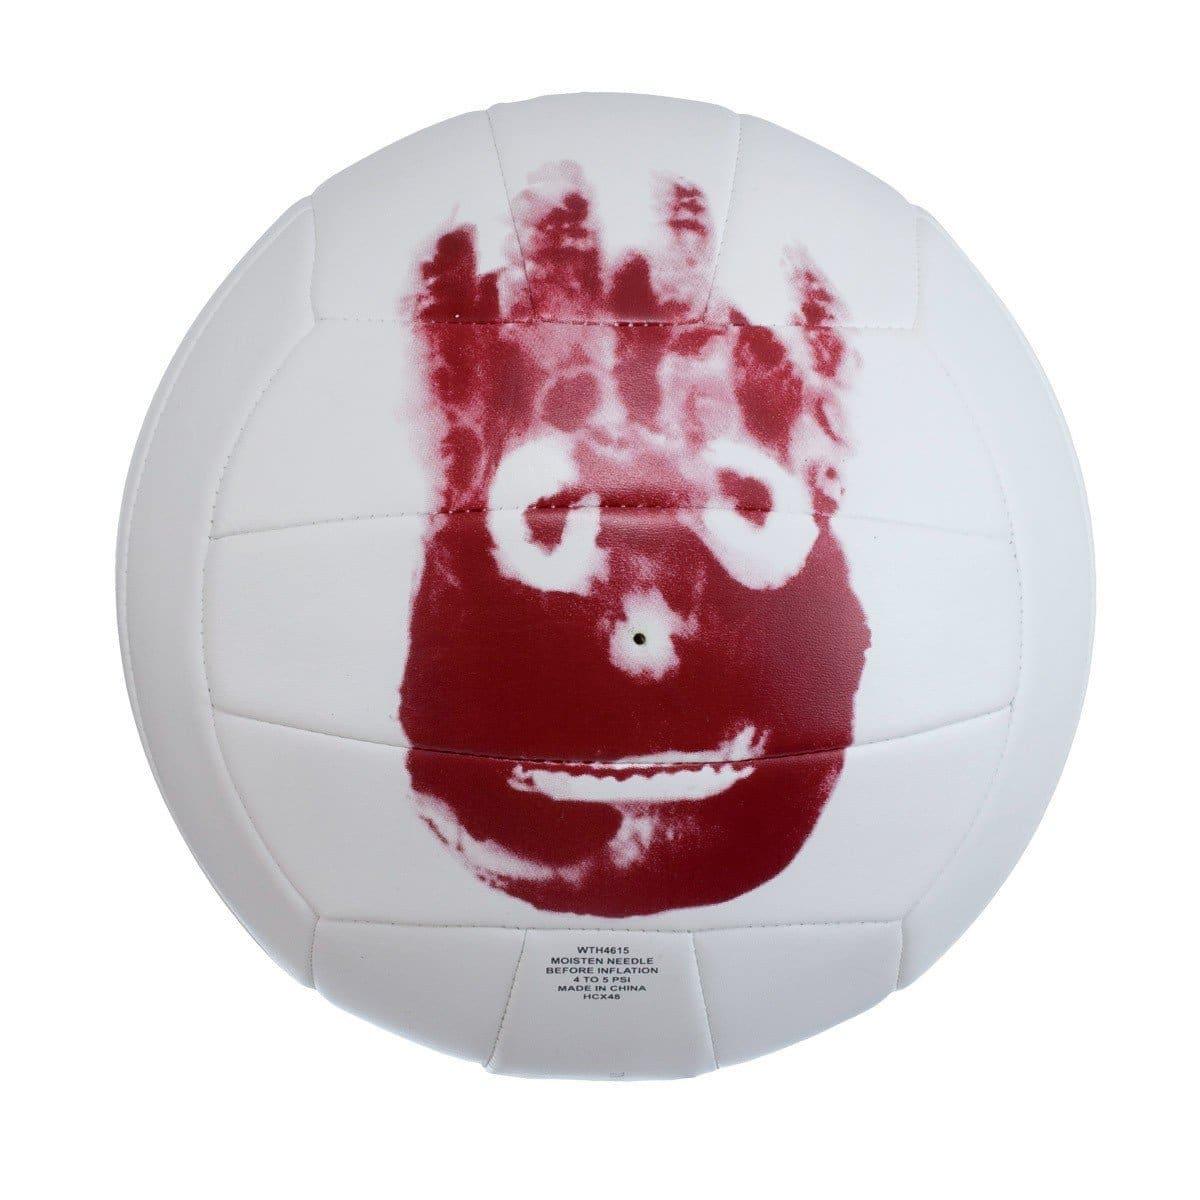 Ballon Wilson insolite